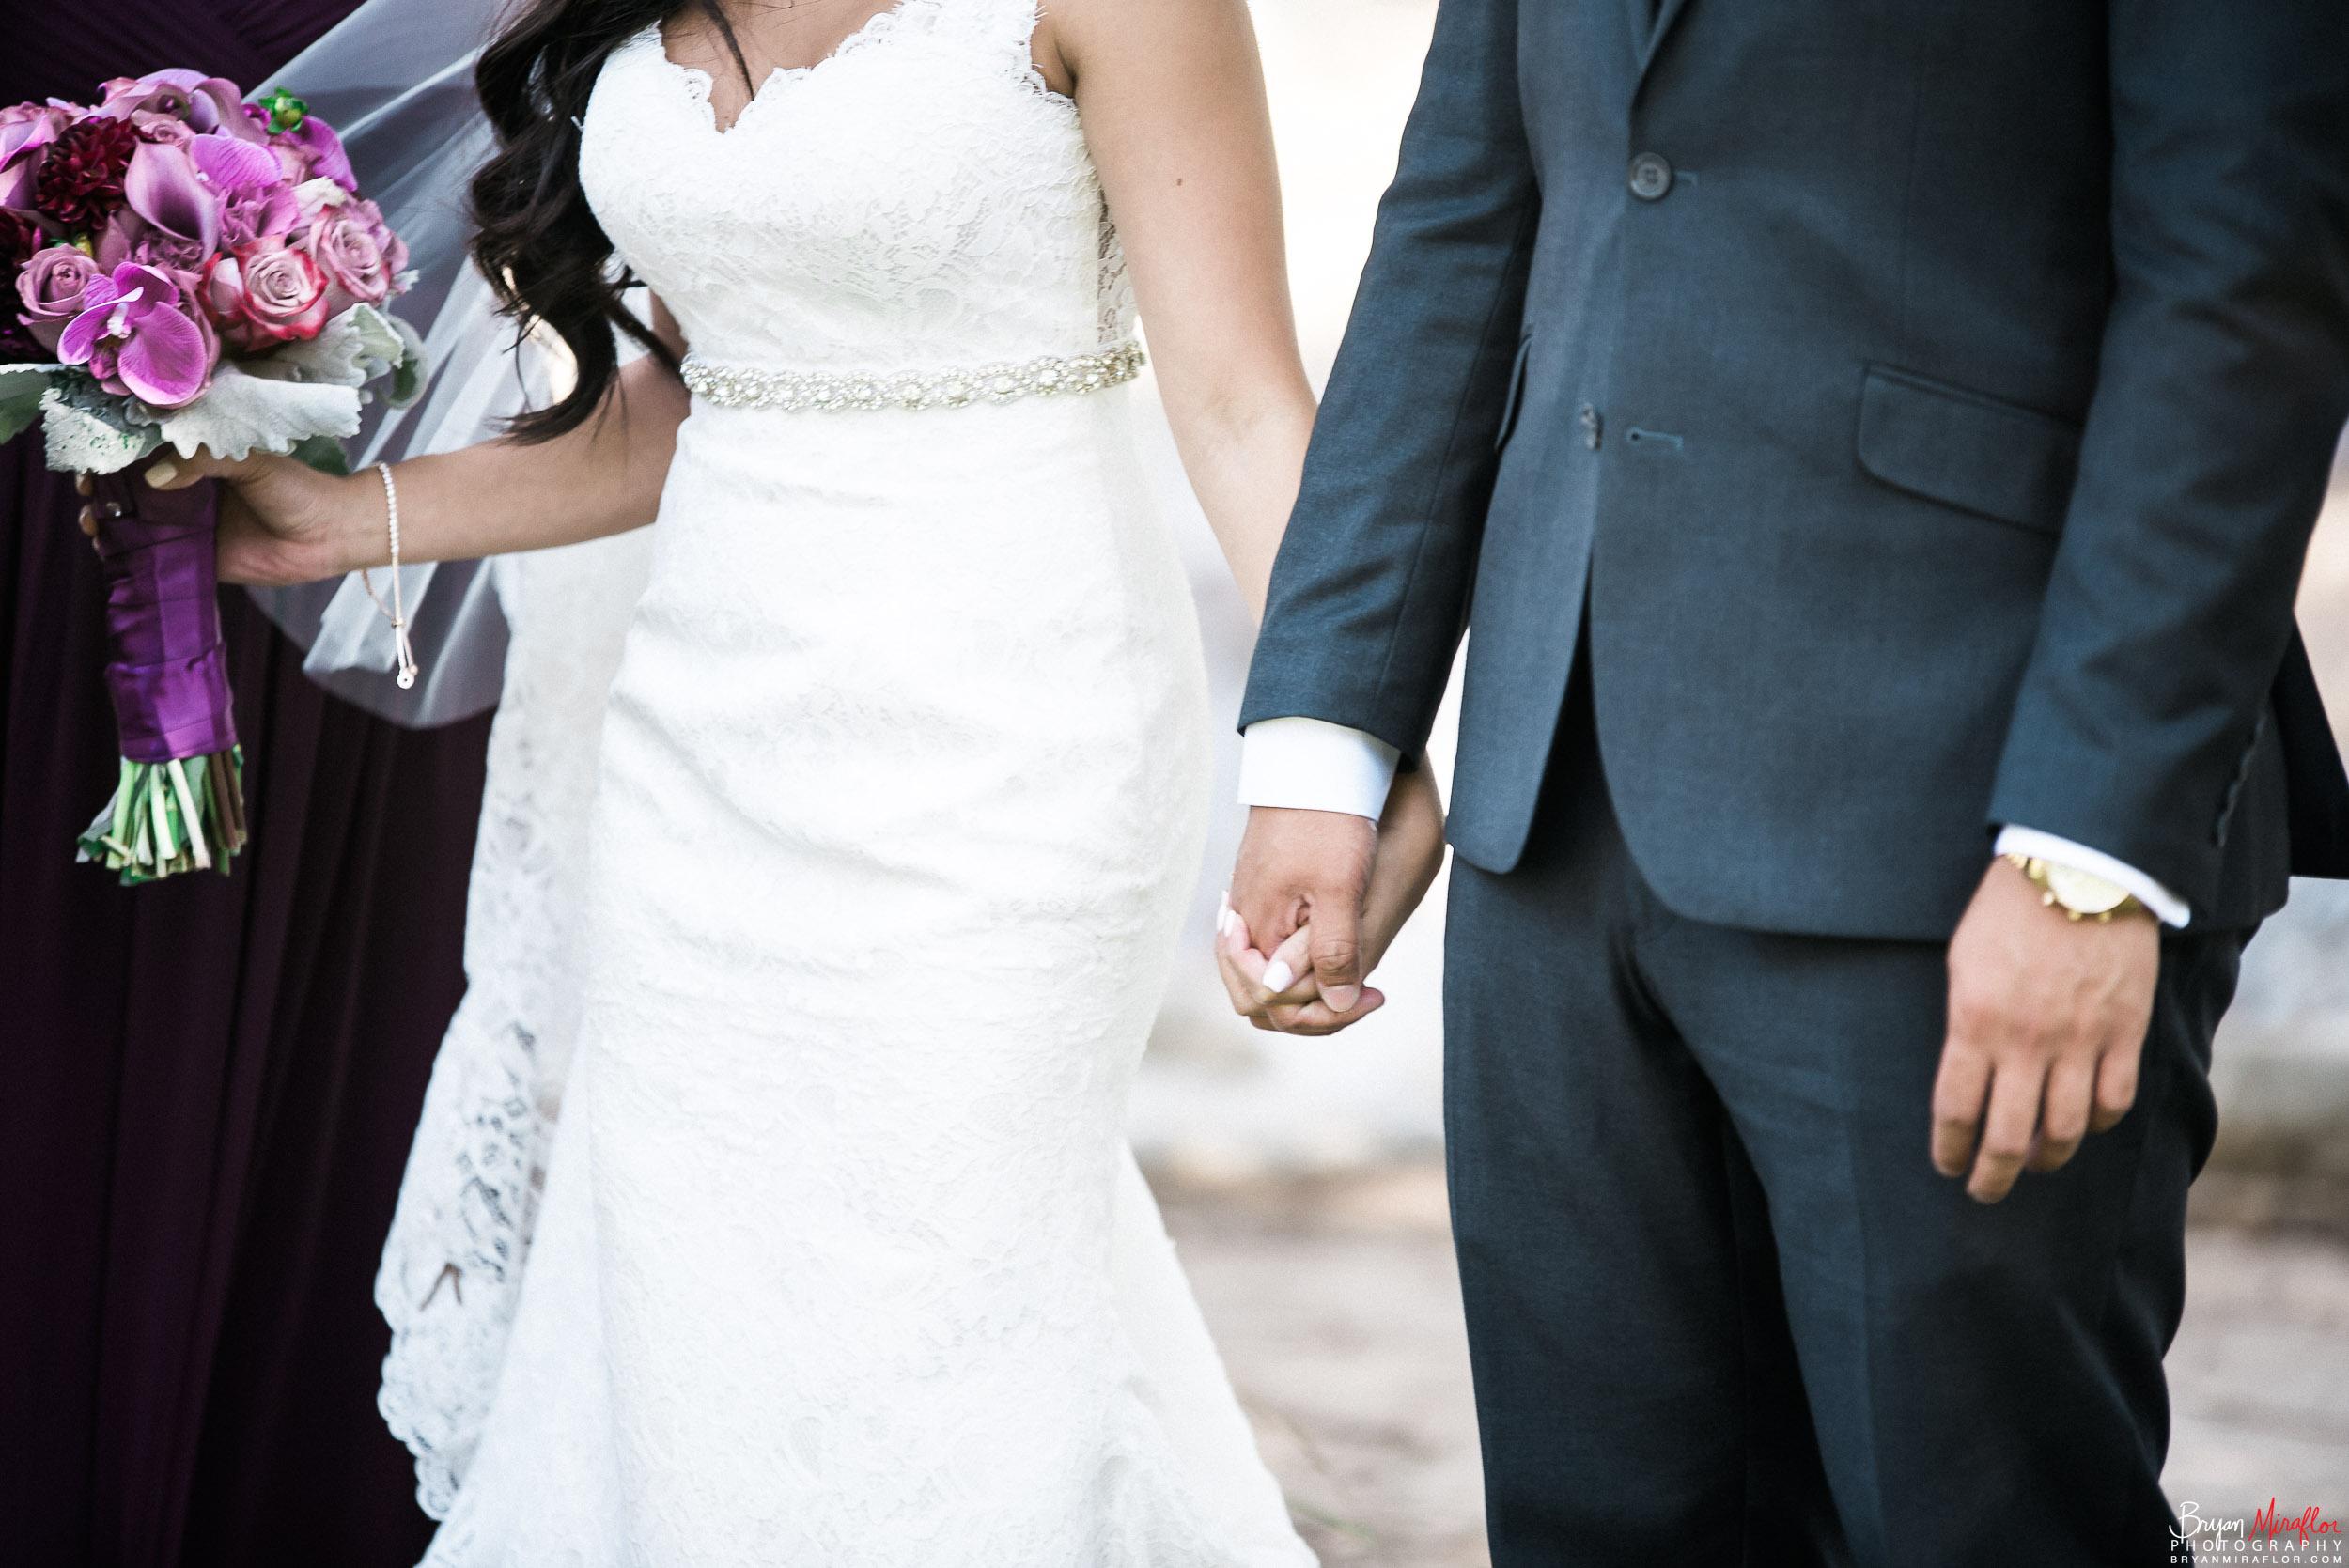 Bryan-Miraflor-Photography-Trisha-Dexter-Married-20170923-023.jpg